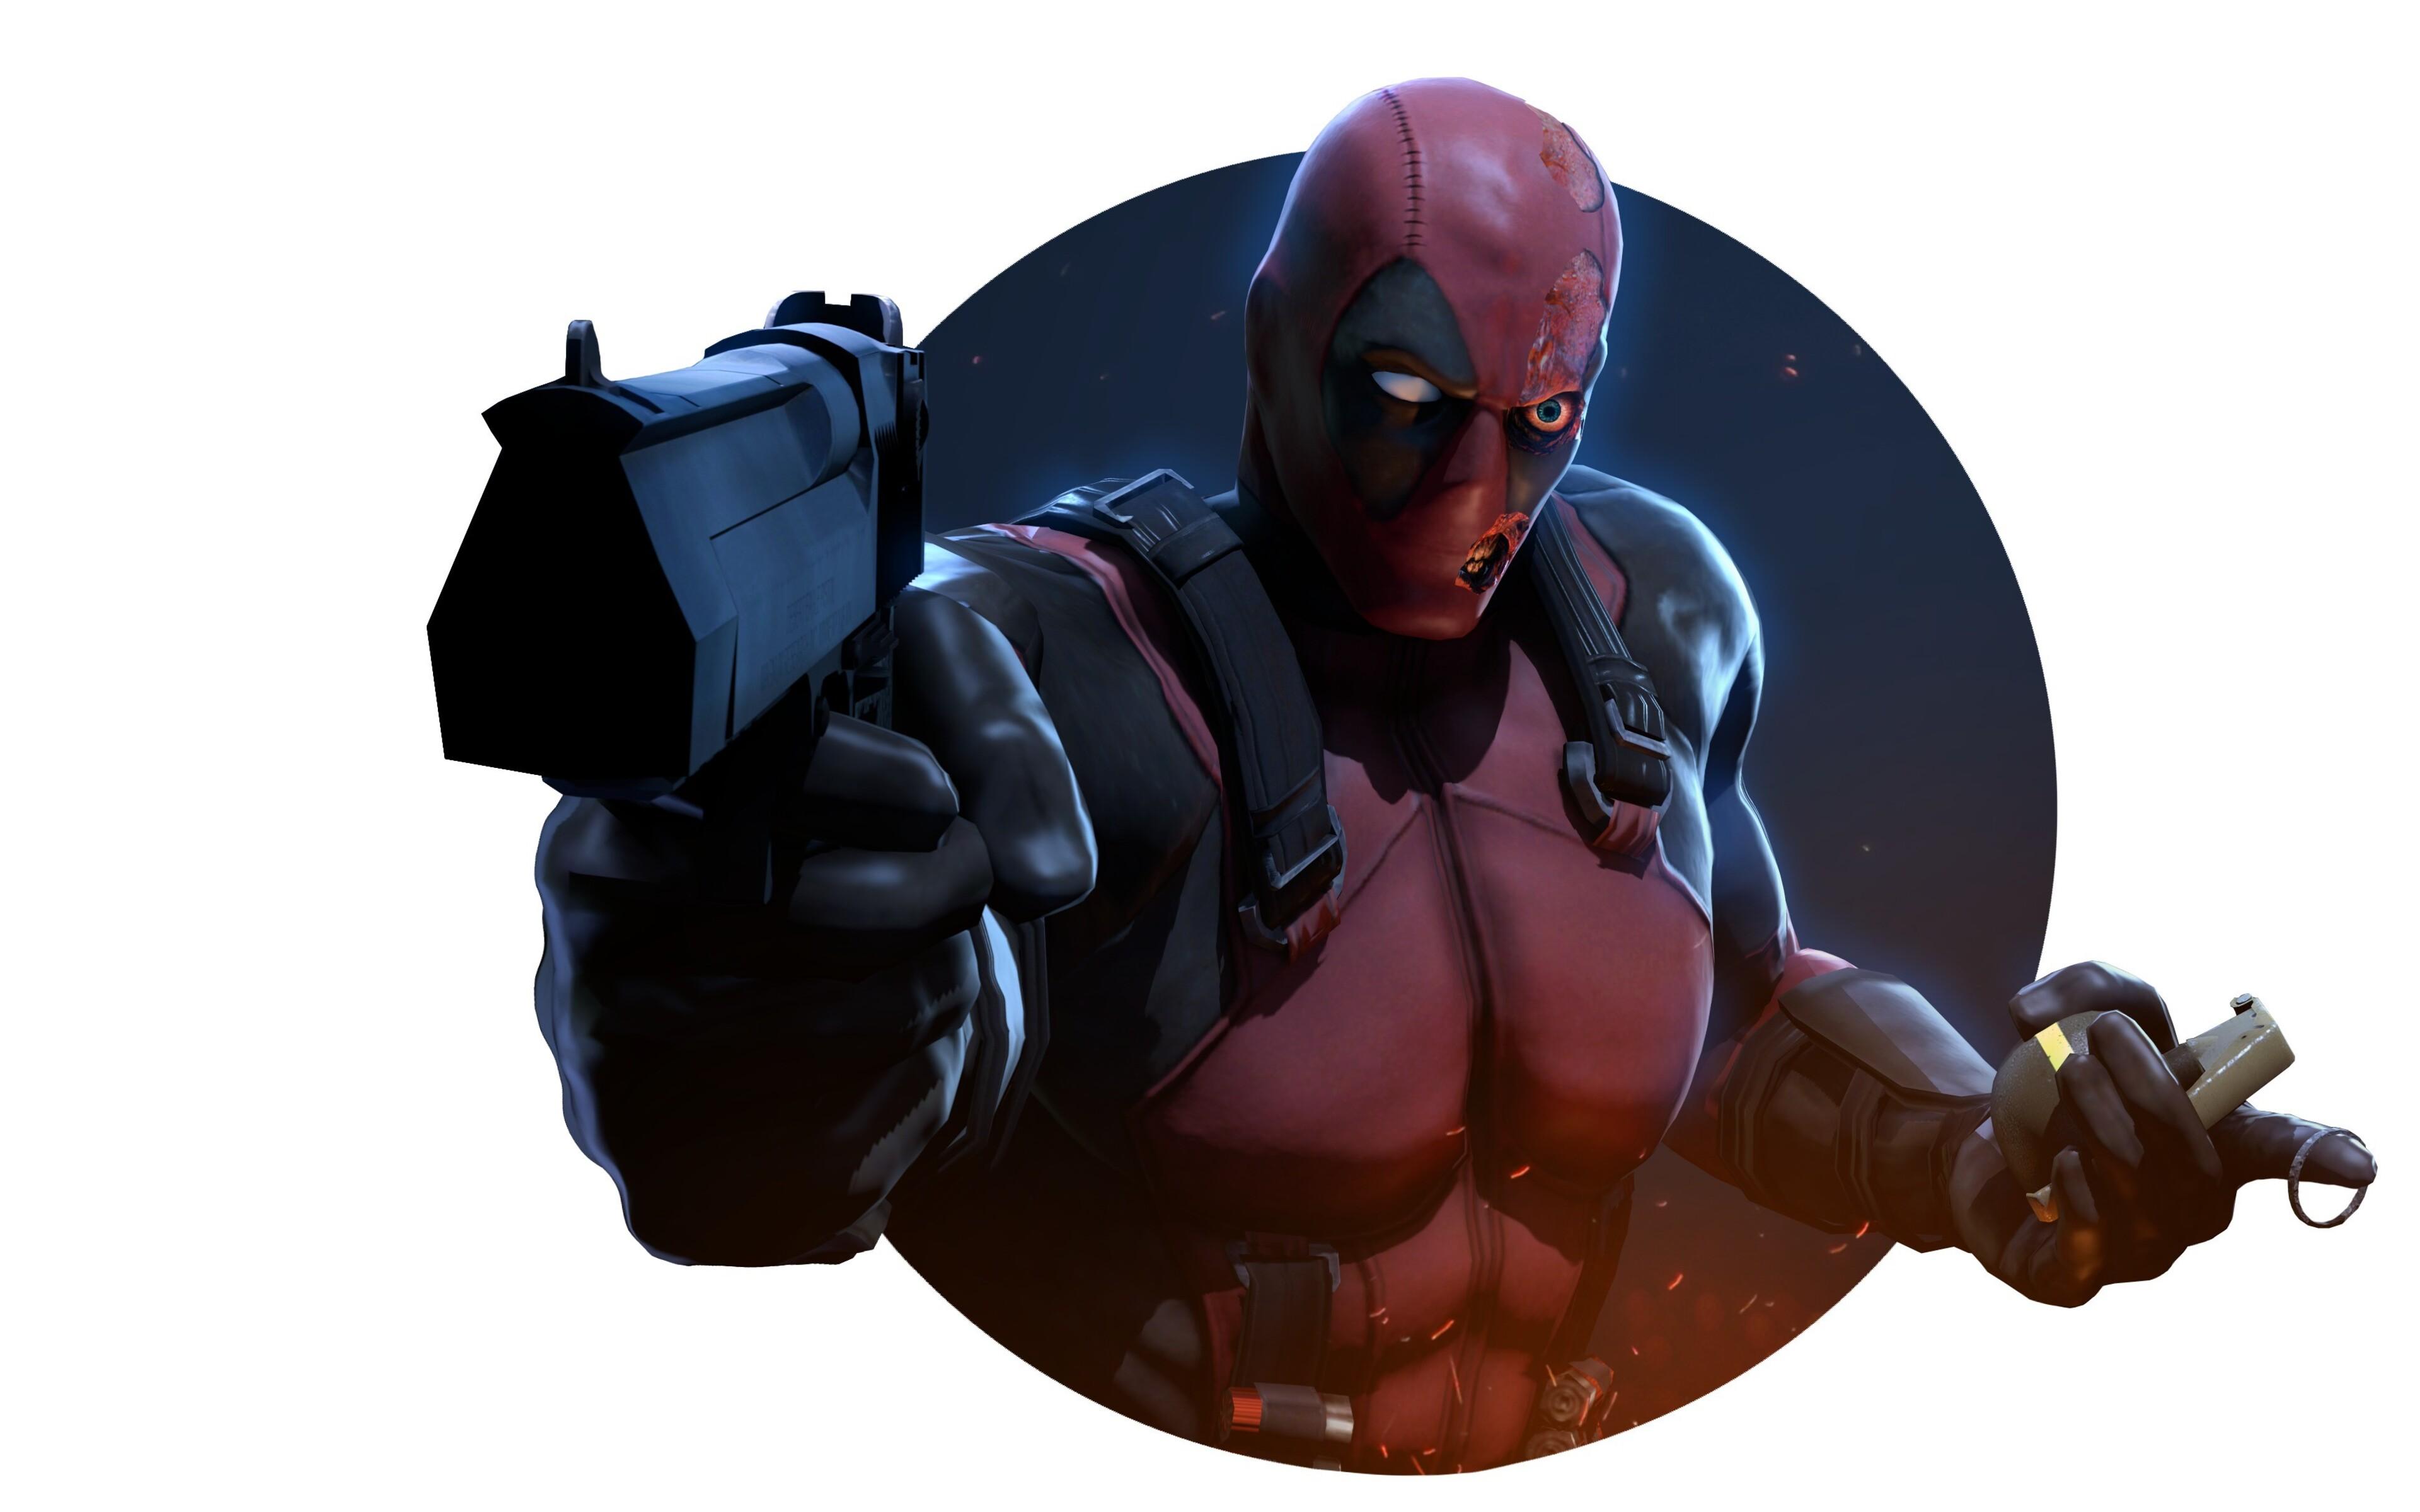 deadpool-with-gun-4k-pl.jpg